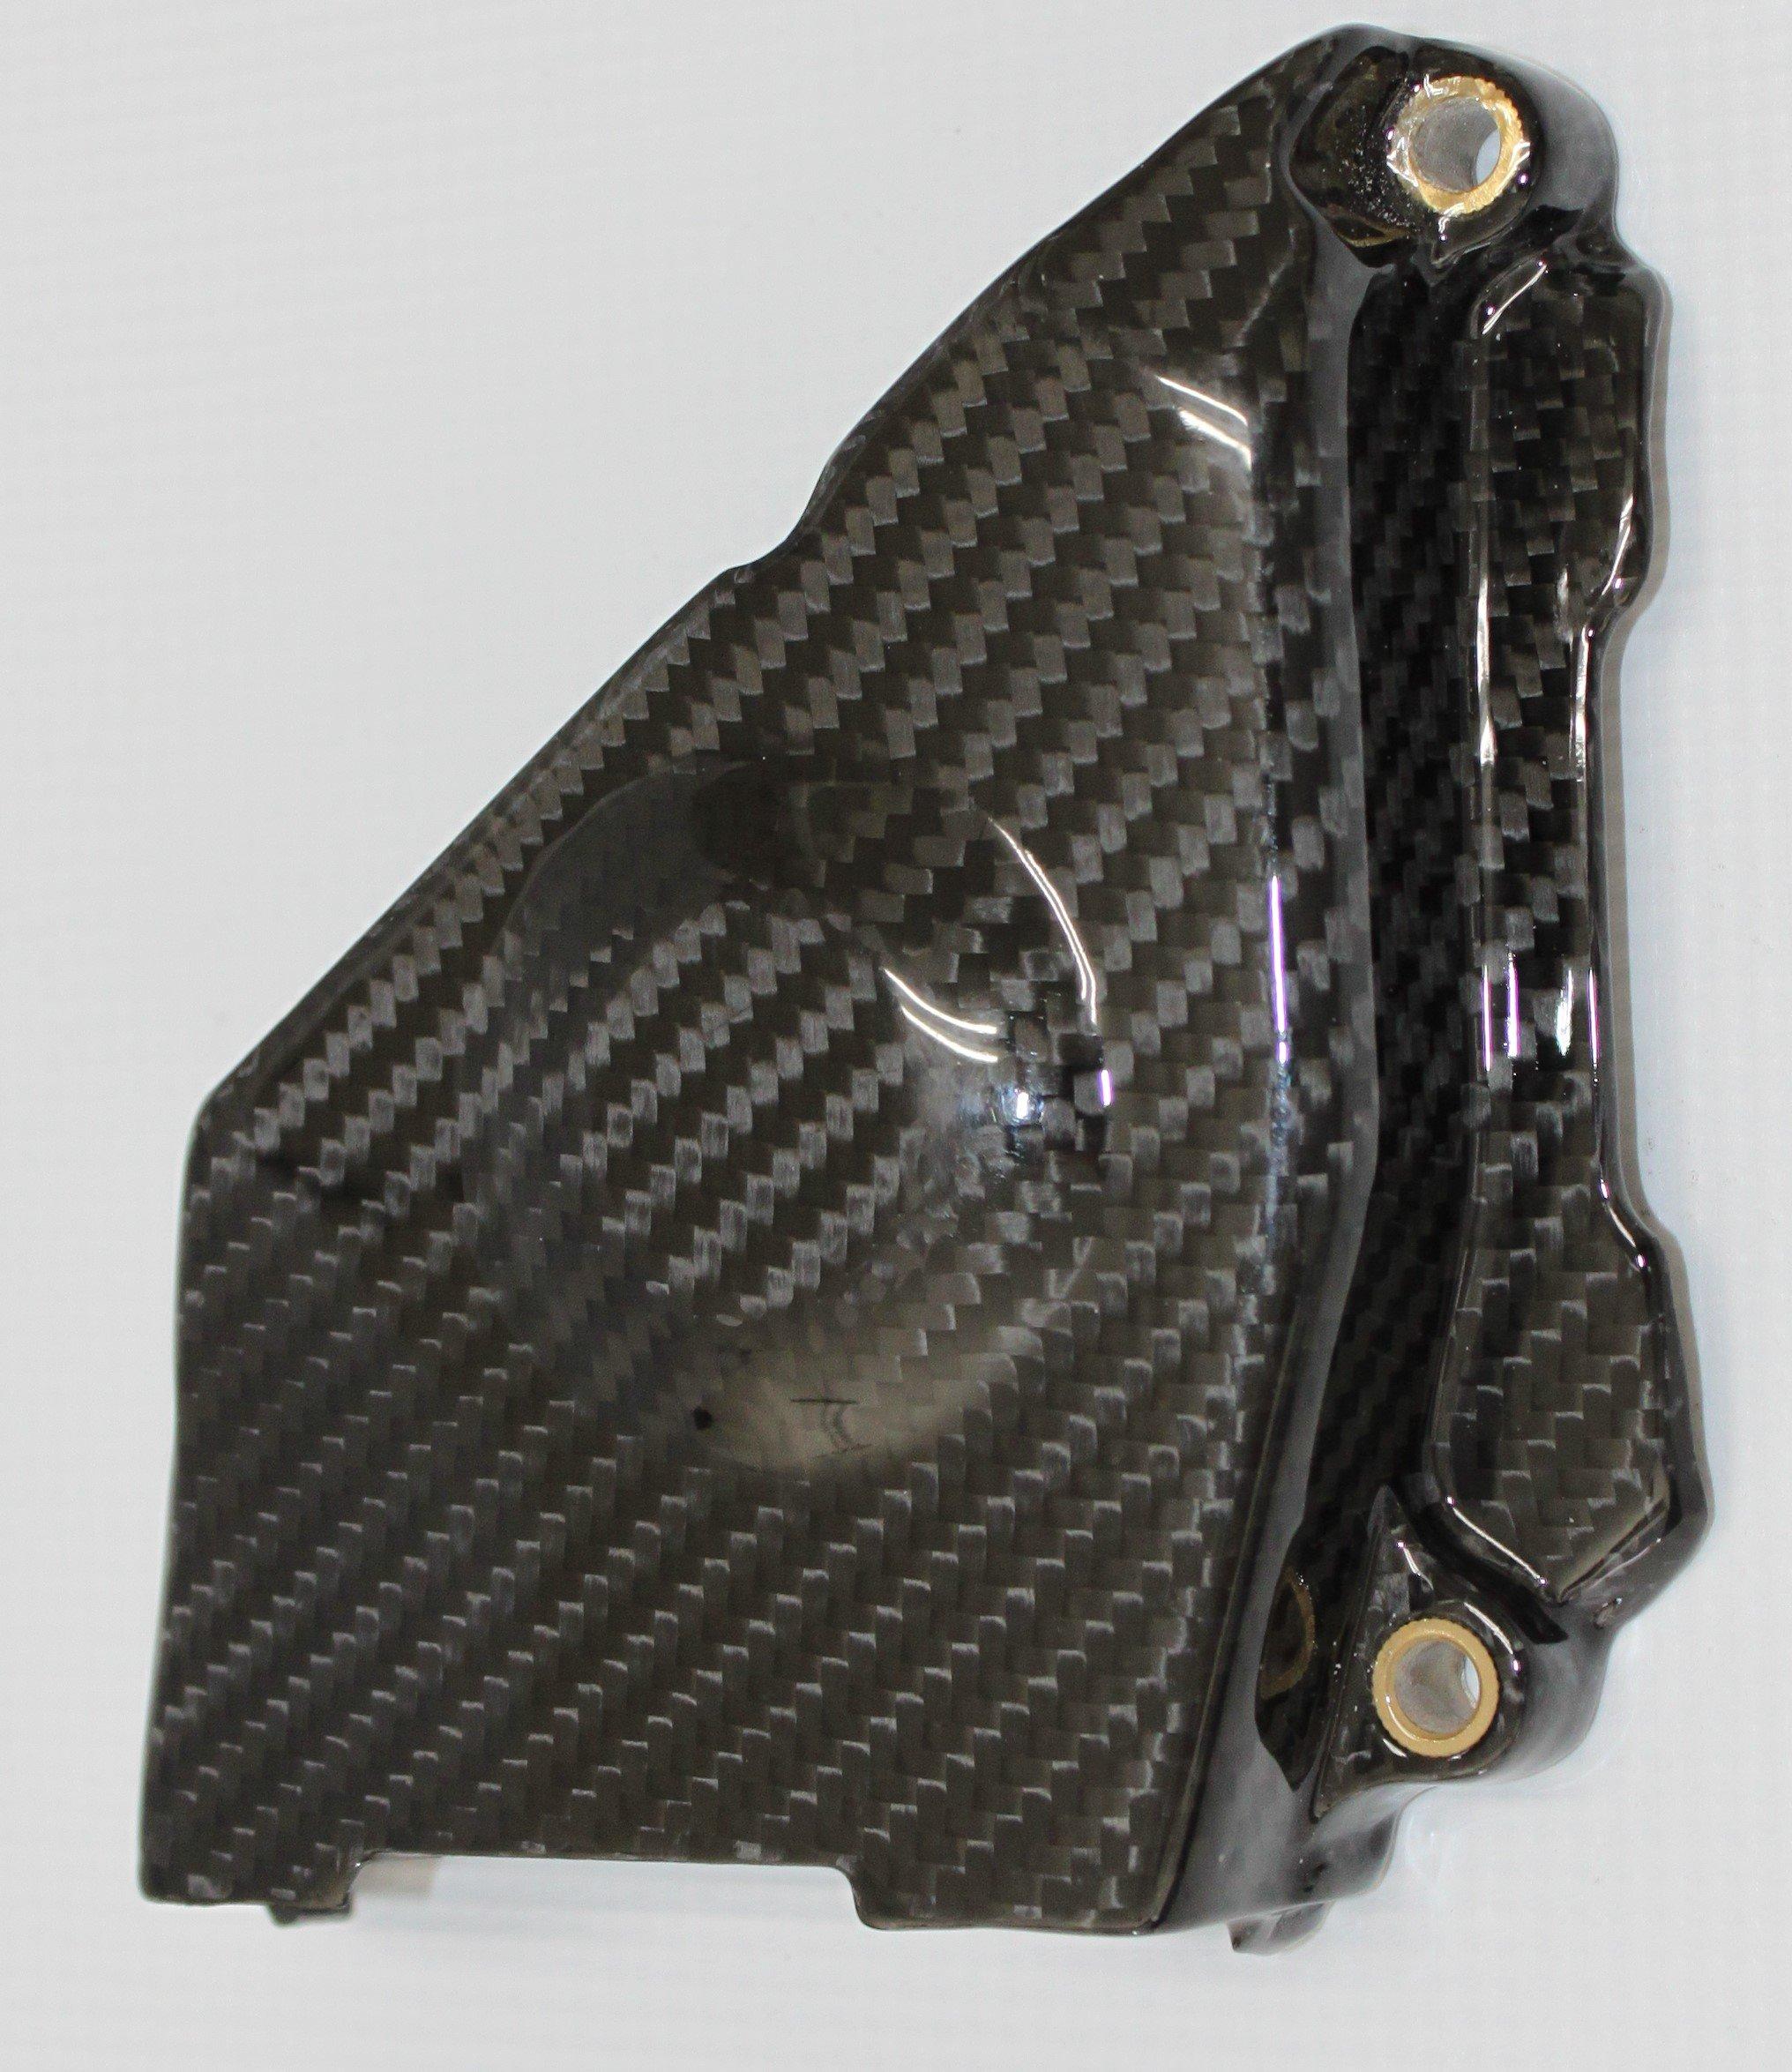 Carbon Fiber Racing, D7D116CFFG, Carbon Fiber / Fiberglass Ducati 749 999 Middle Belt Cover with Brass Inserts